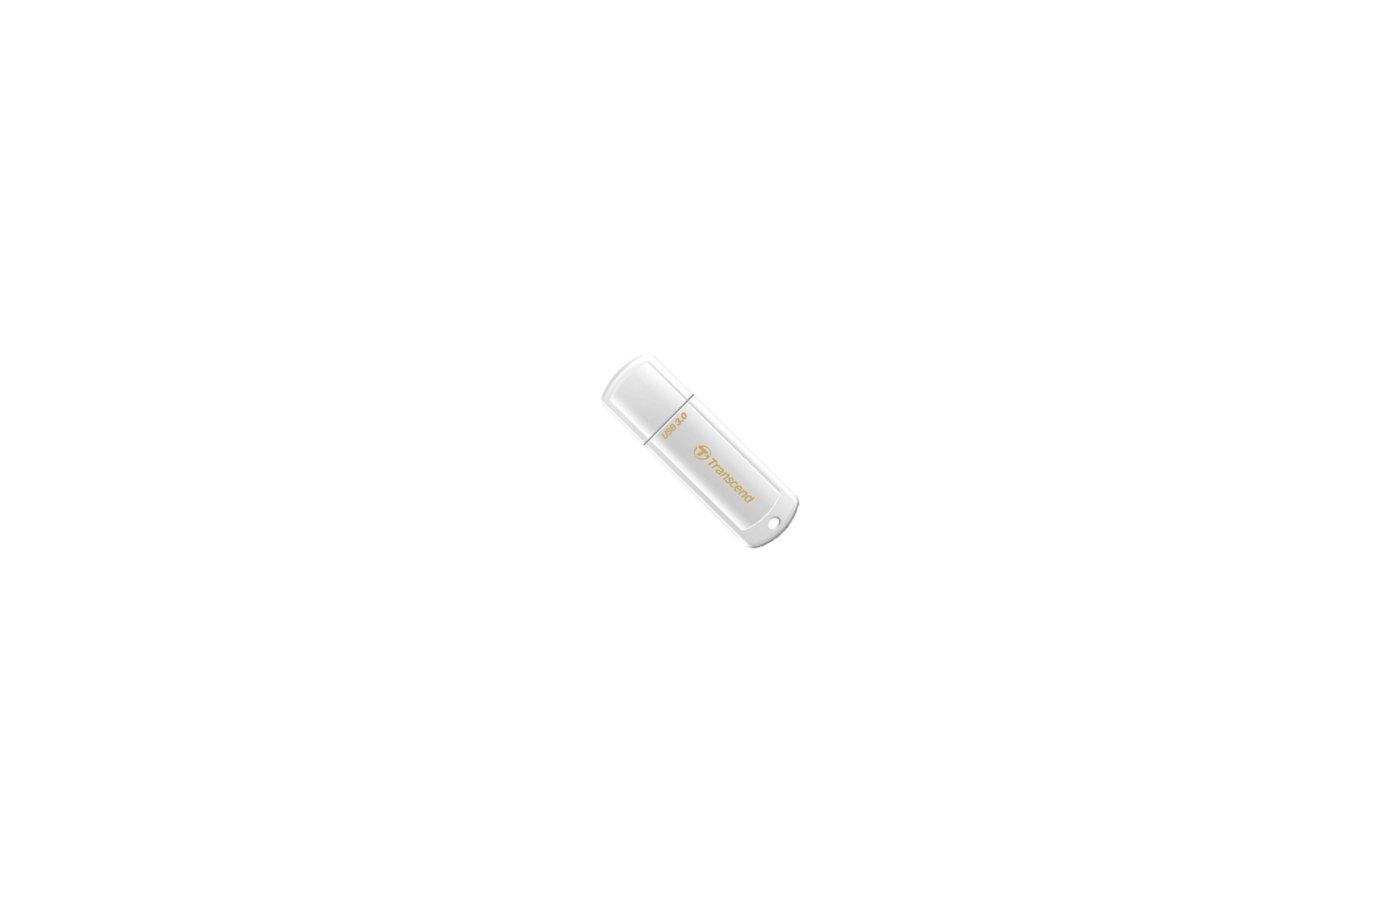 Флеш-диск USB3.0 Transcend Jetflash 730 16GB (TS16GJF730)